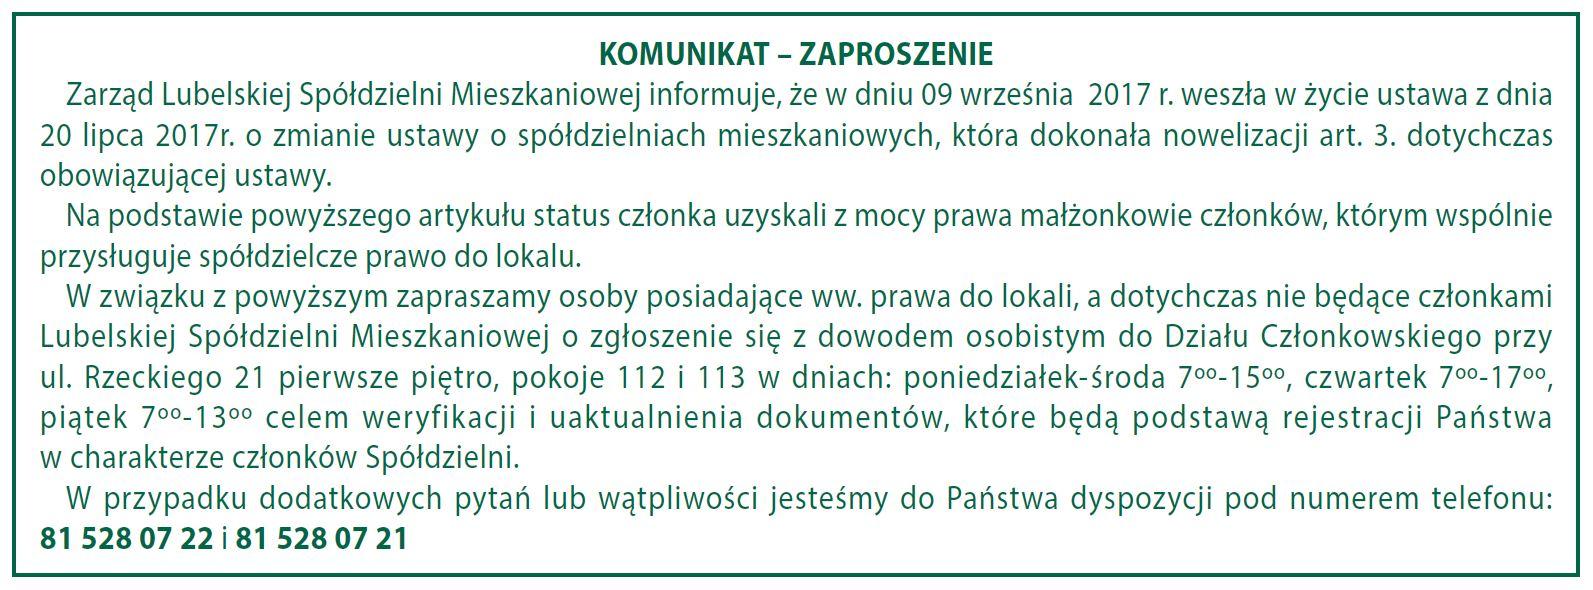 Komunikat_zaproszenie